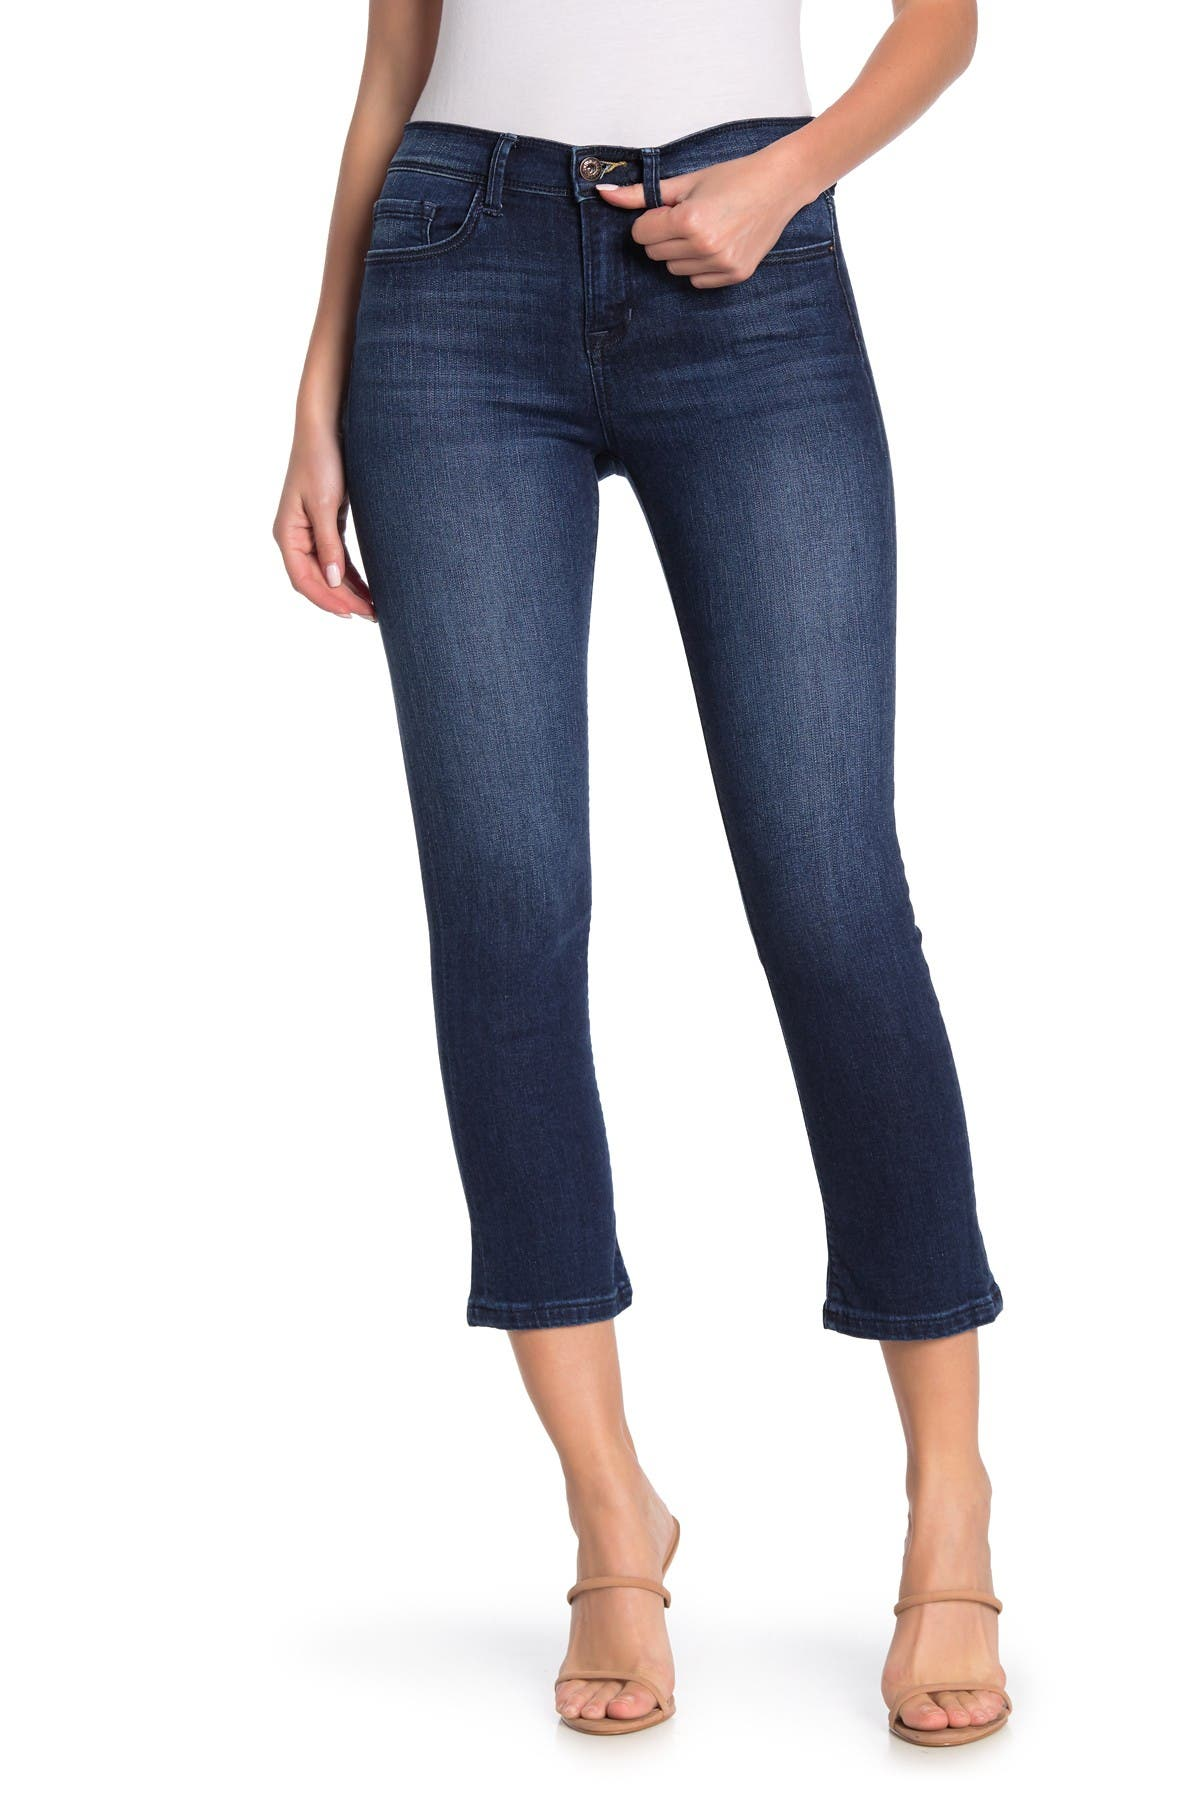 Image of Sneak Peek Denim Dark Wash Mid Rise Micro Flare Jeans